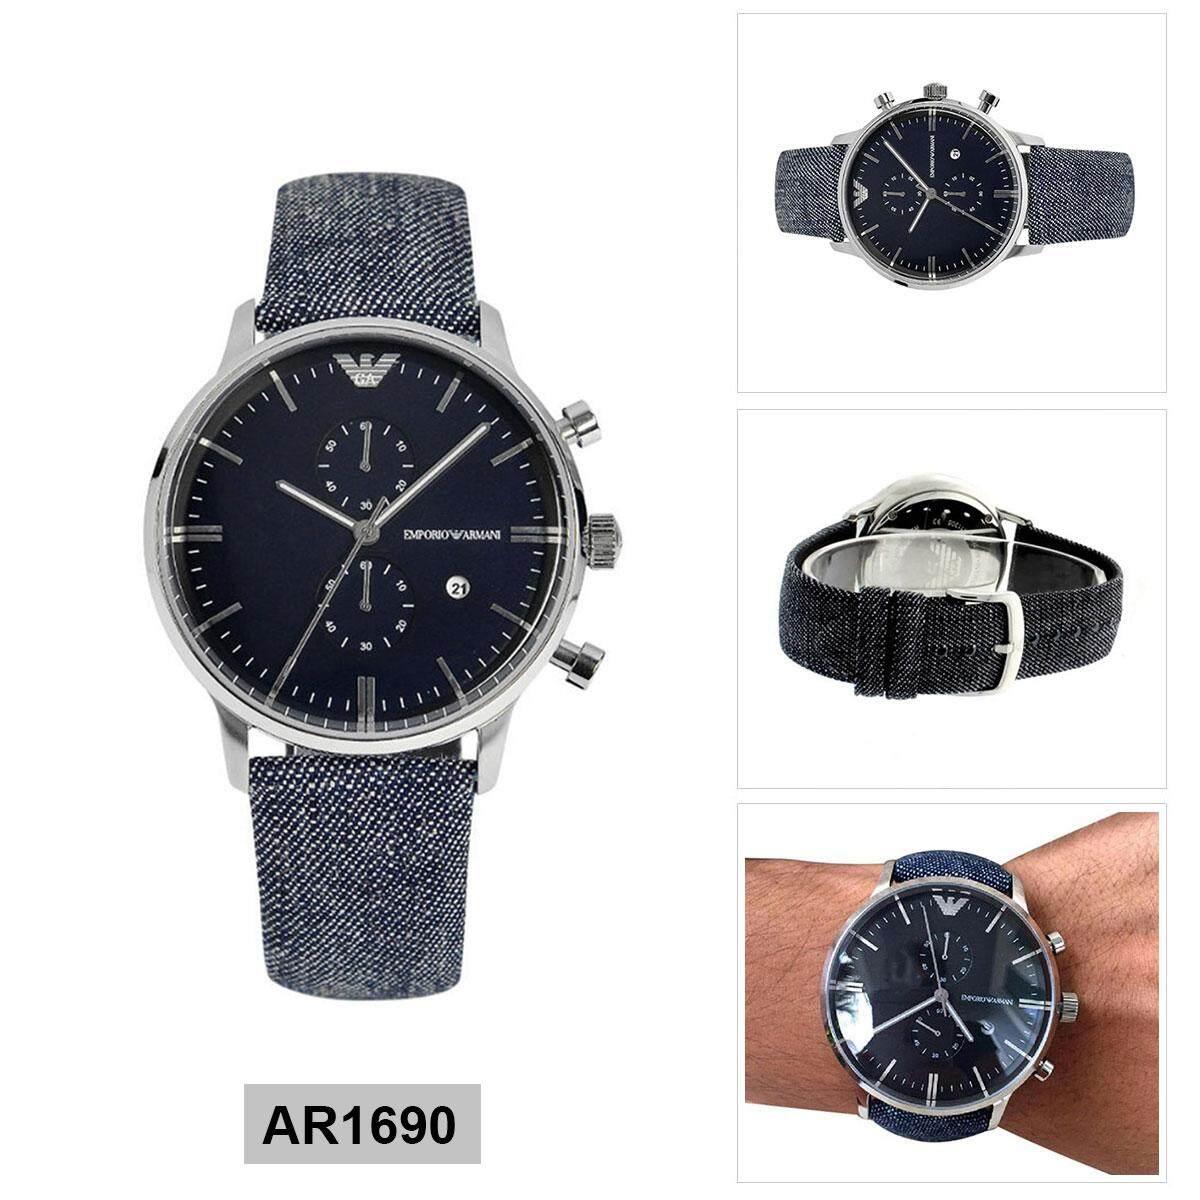 Armani Exchange Philippines  Armani Exchange price list - Watches for sale   4579ba6d5defc